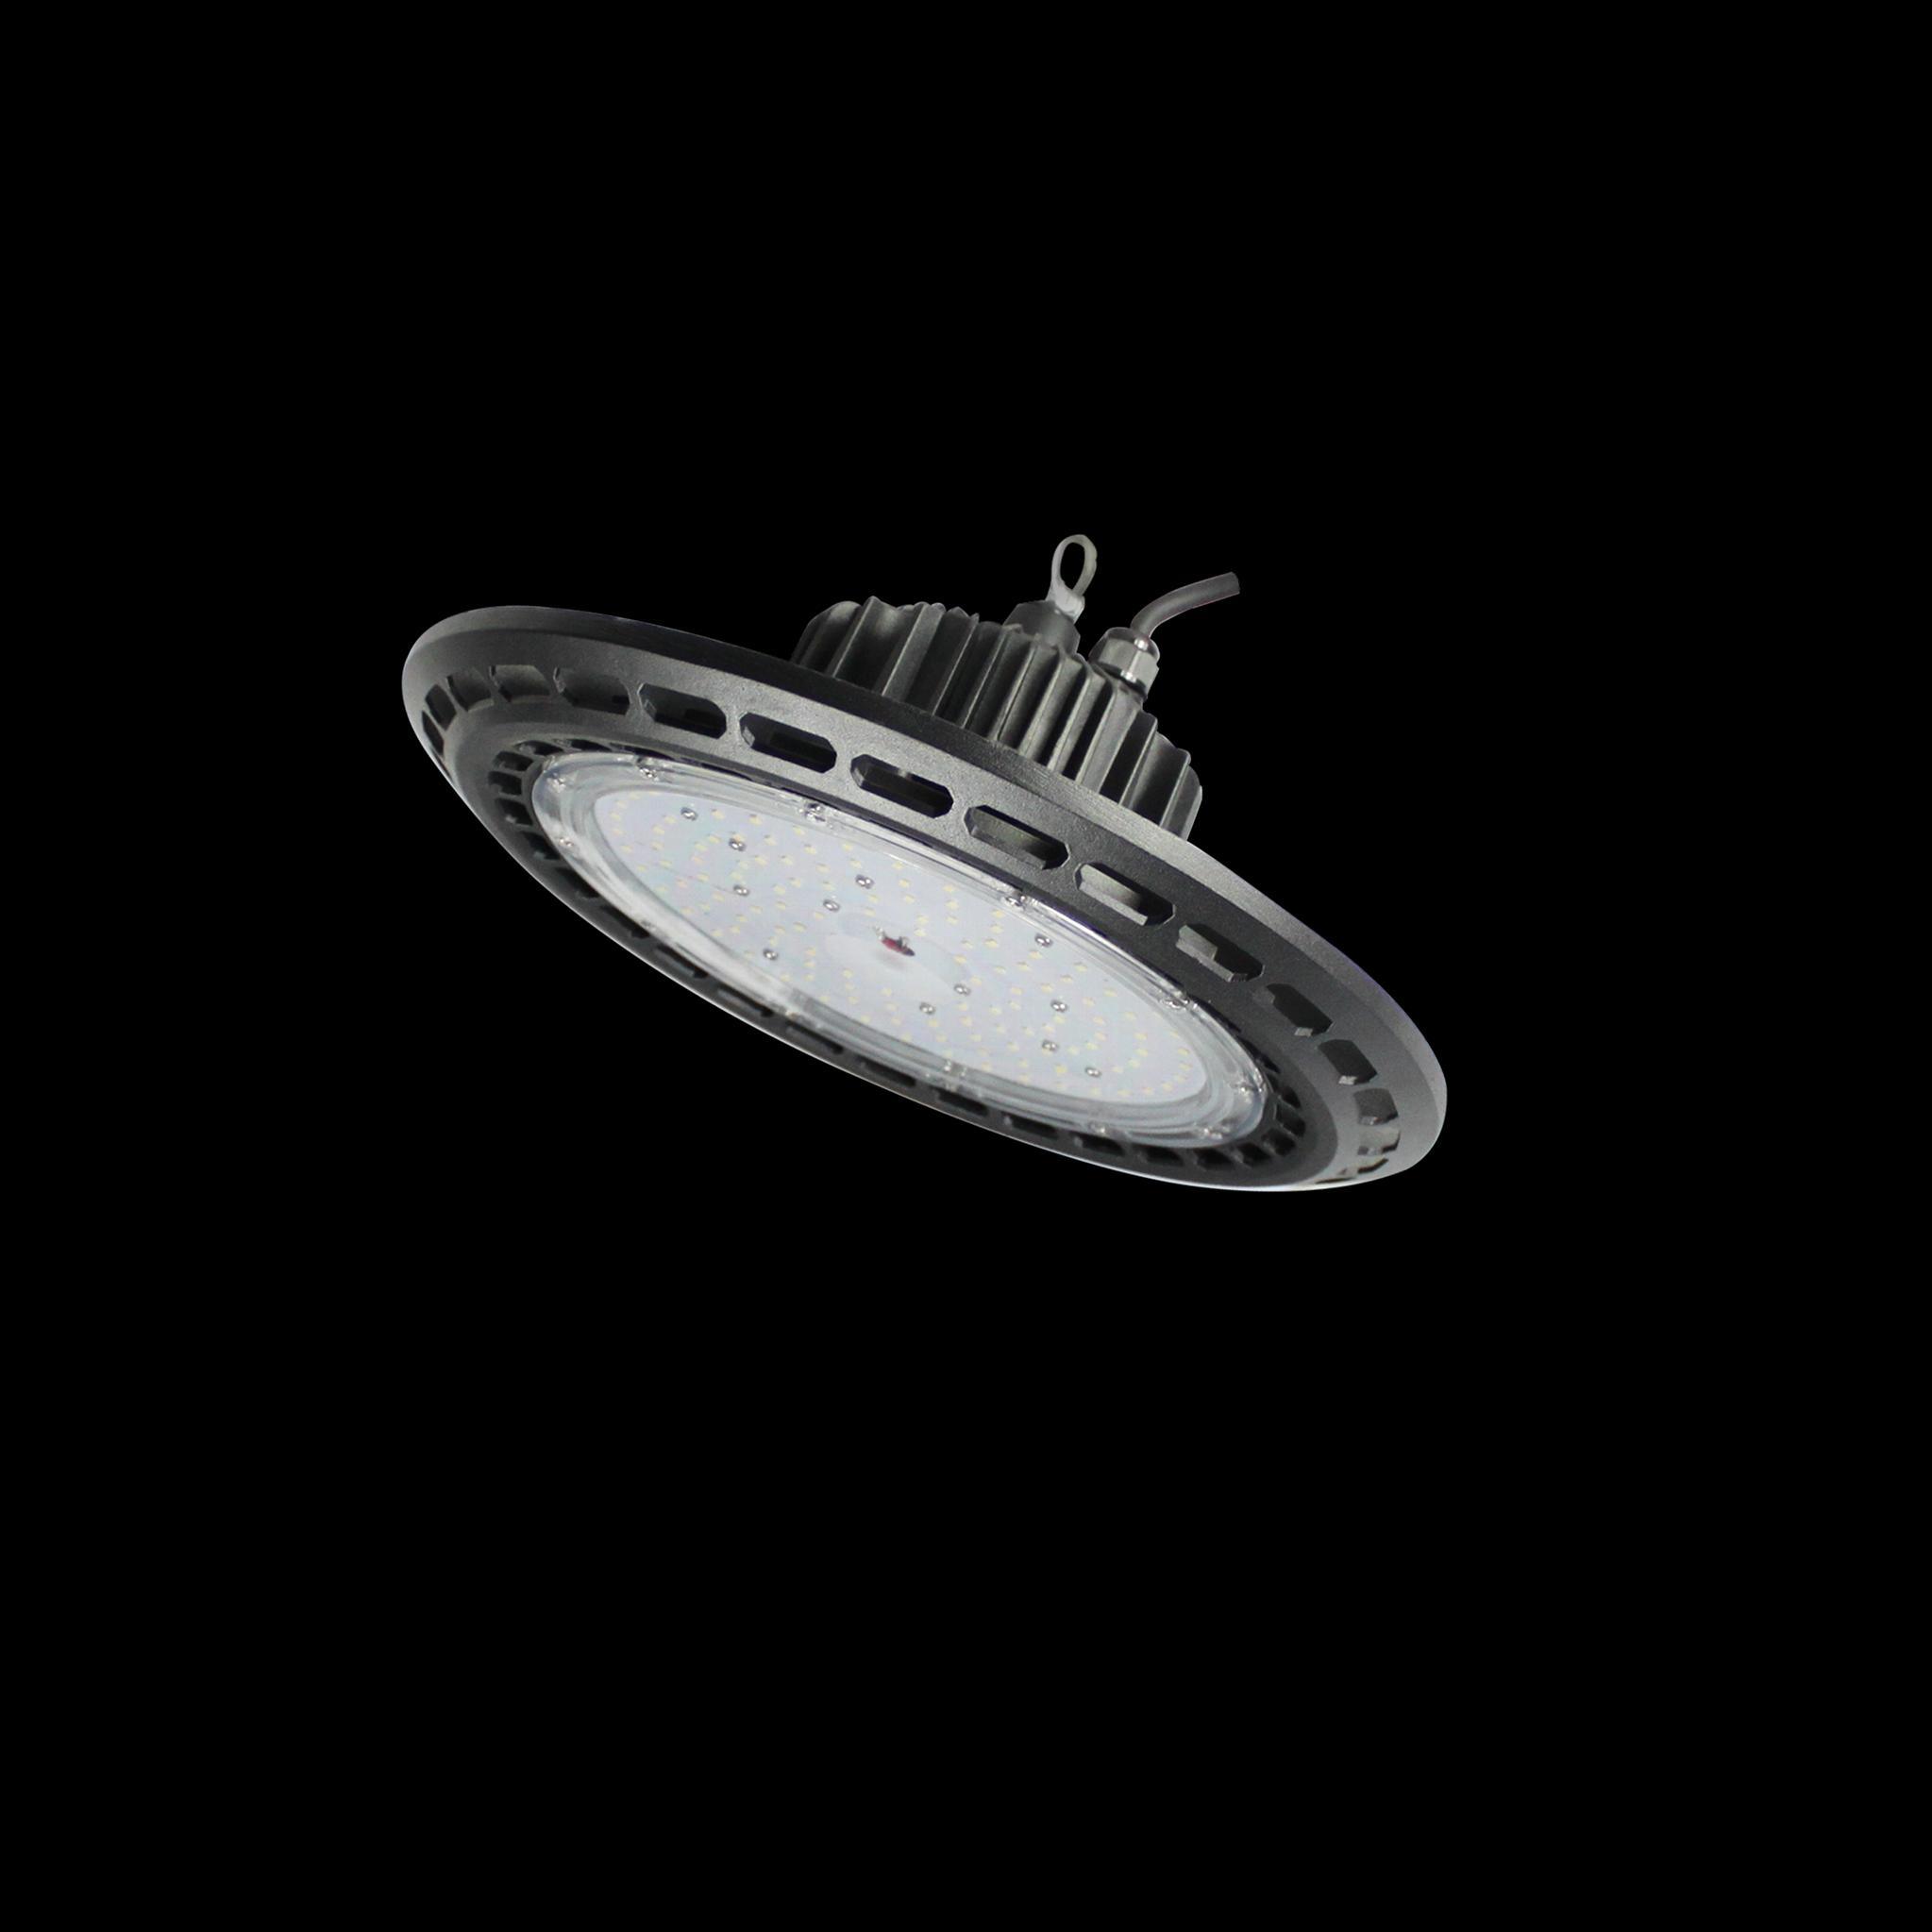 100W UFO industrial lighting